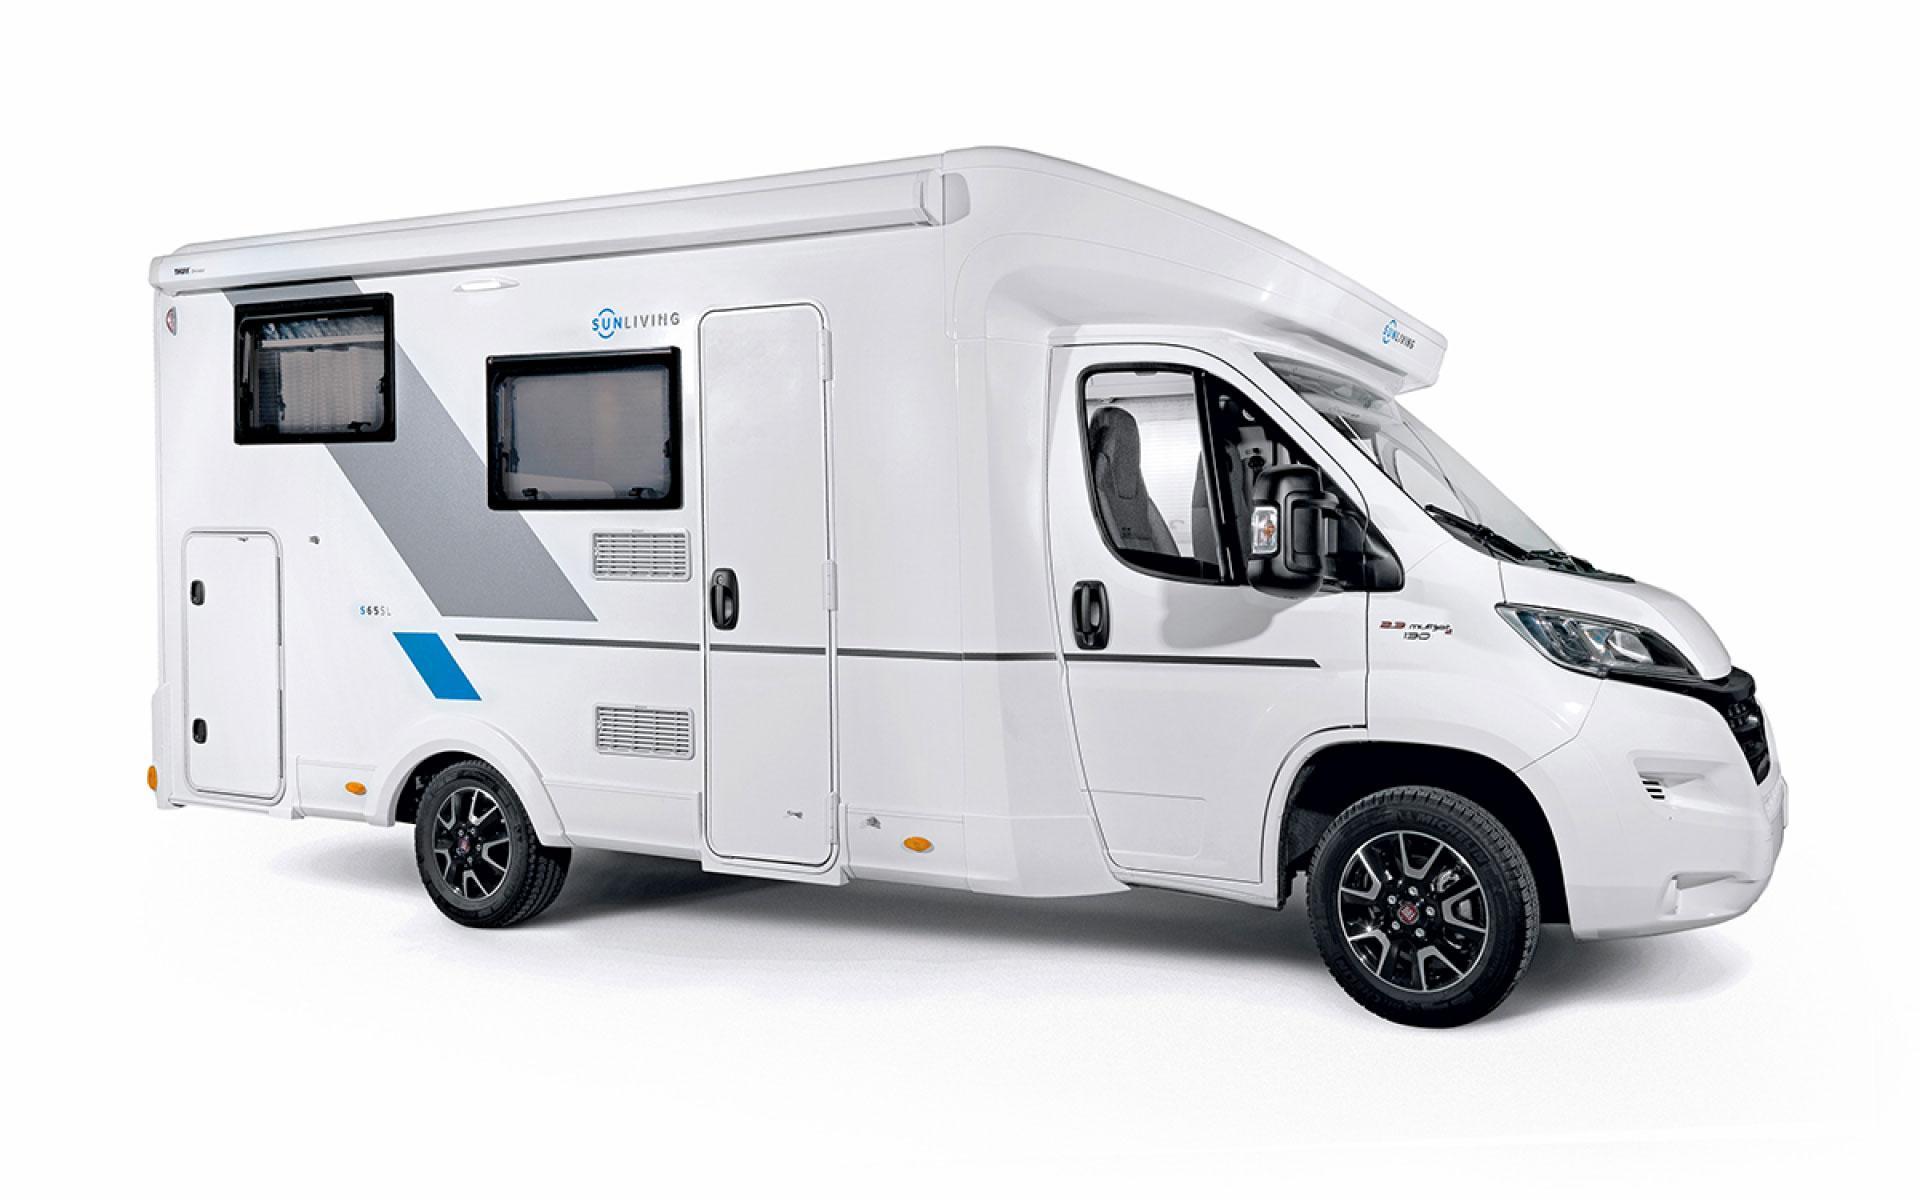 wohnmobil Sun Living S 70 DF